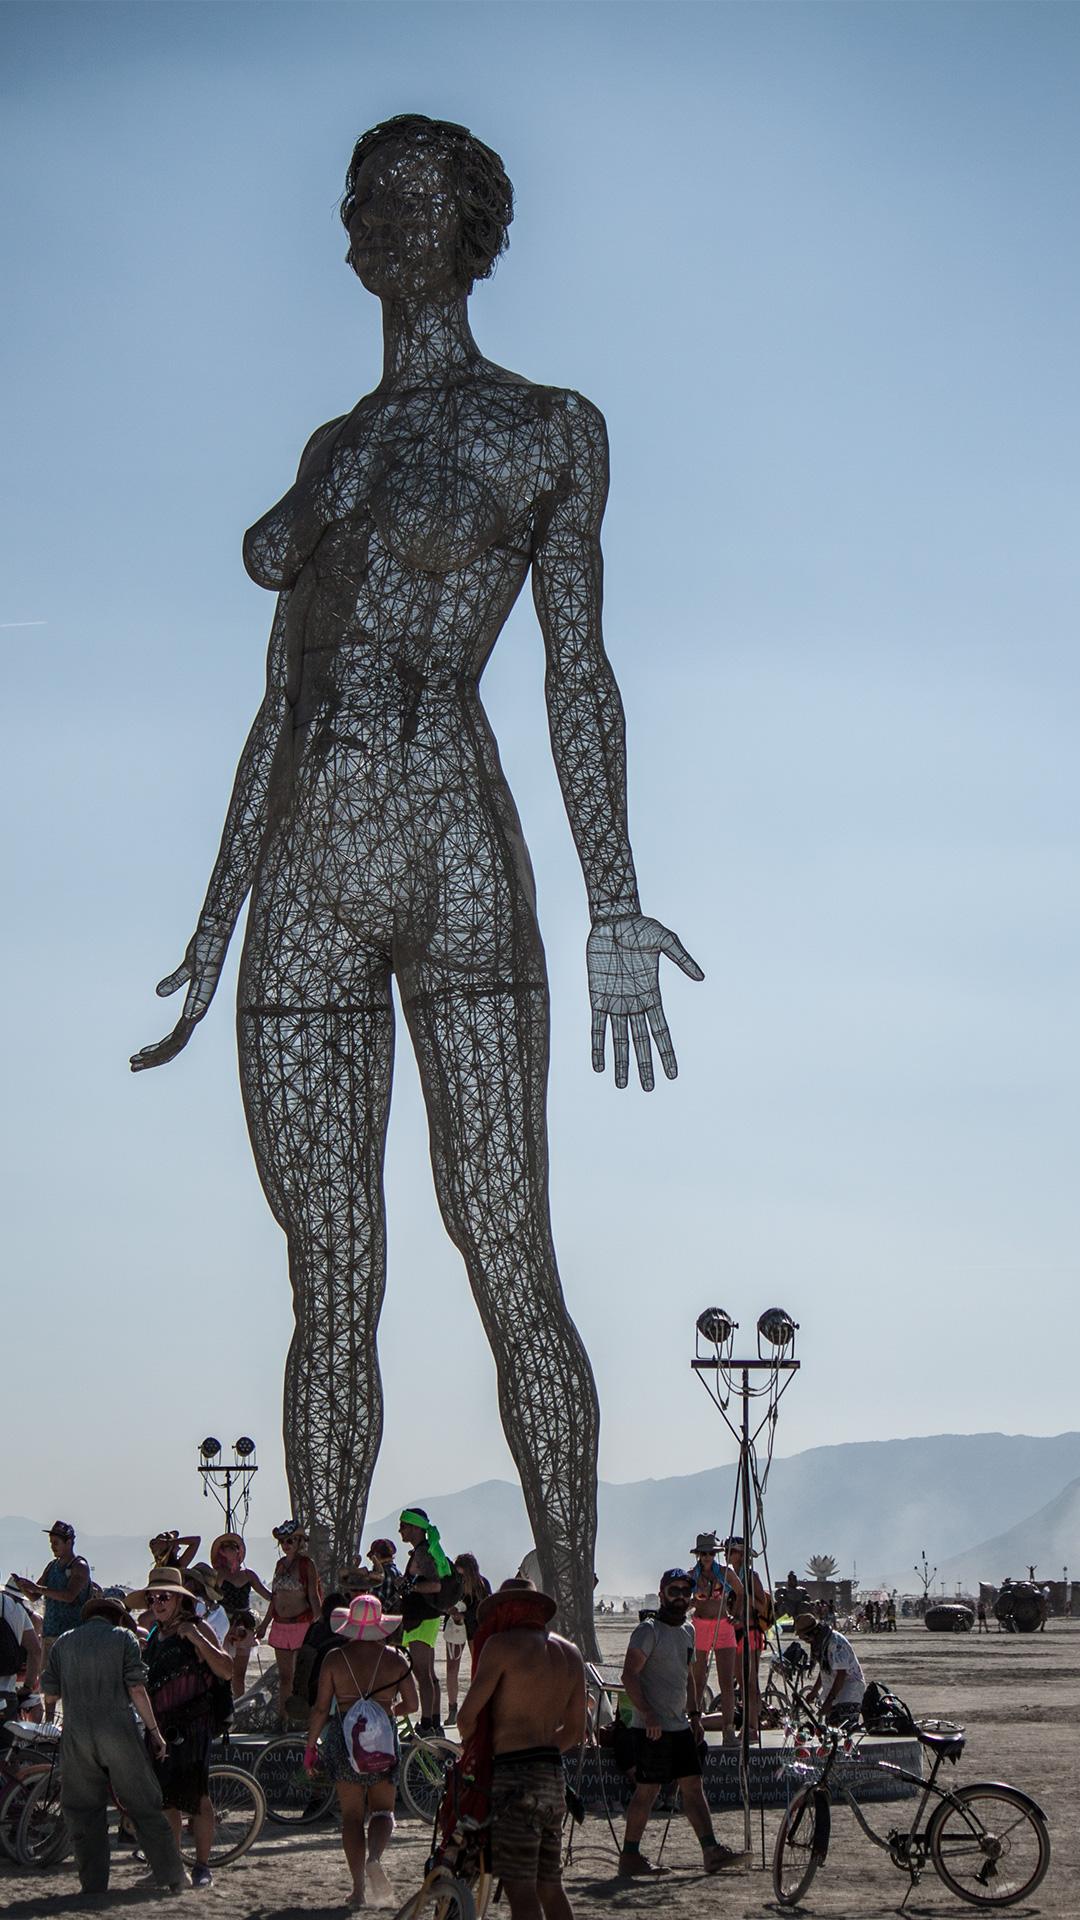 Unglaubliche Kunstwerke: diese Frau atmet